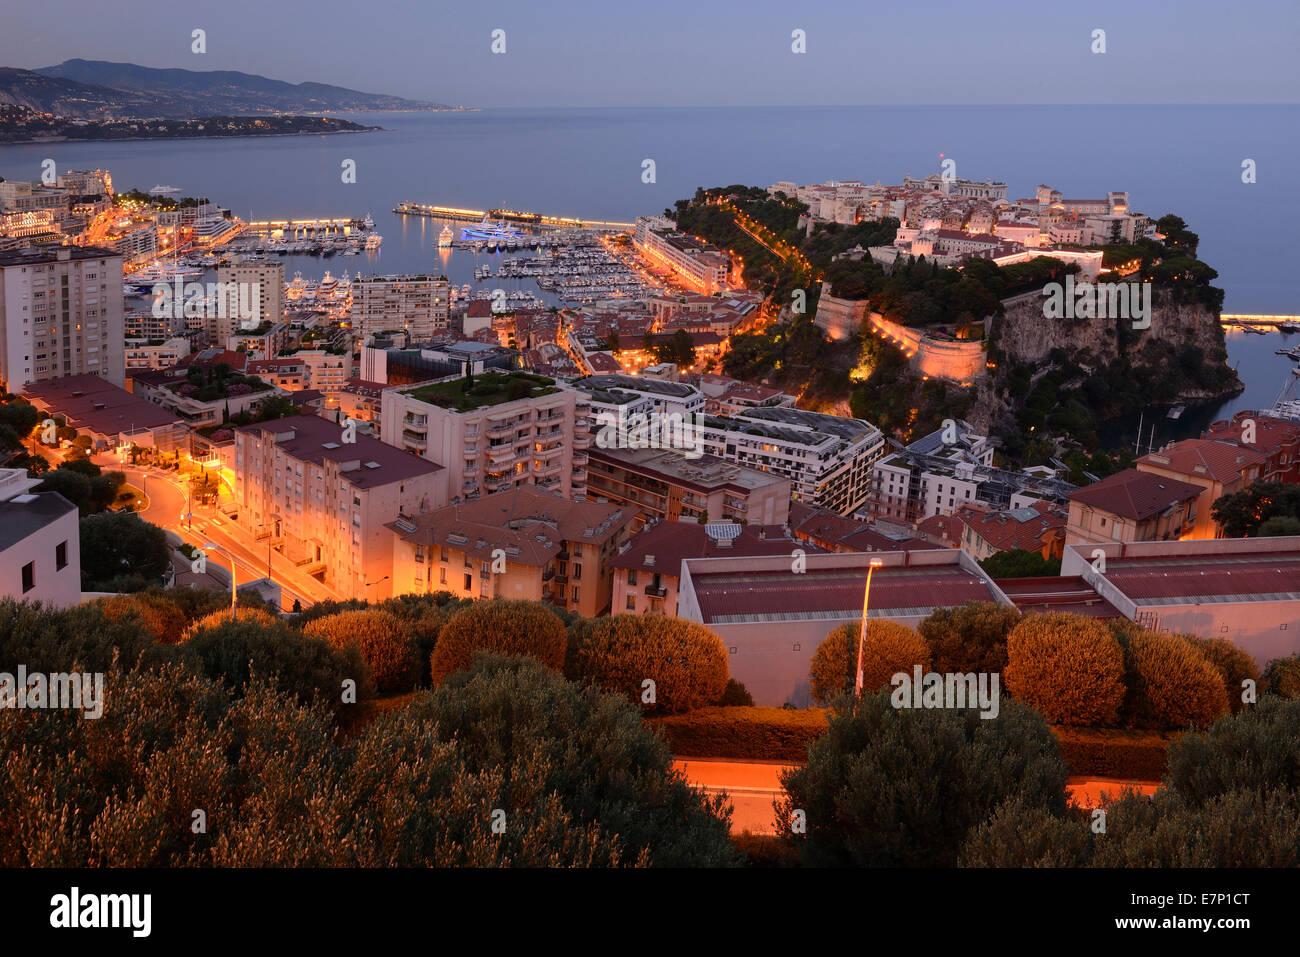 Europe, France, Monaco, Monte Carlo, French, Riviera, marina, luxury, Mediterranean, coast, city, tax haven, night - Stock Image